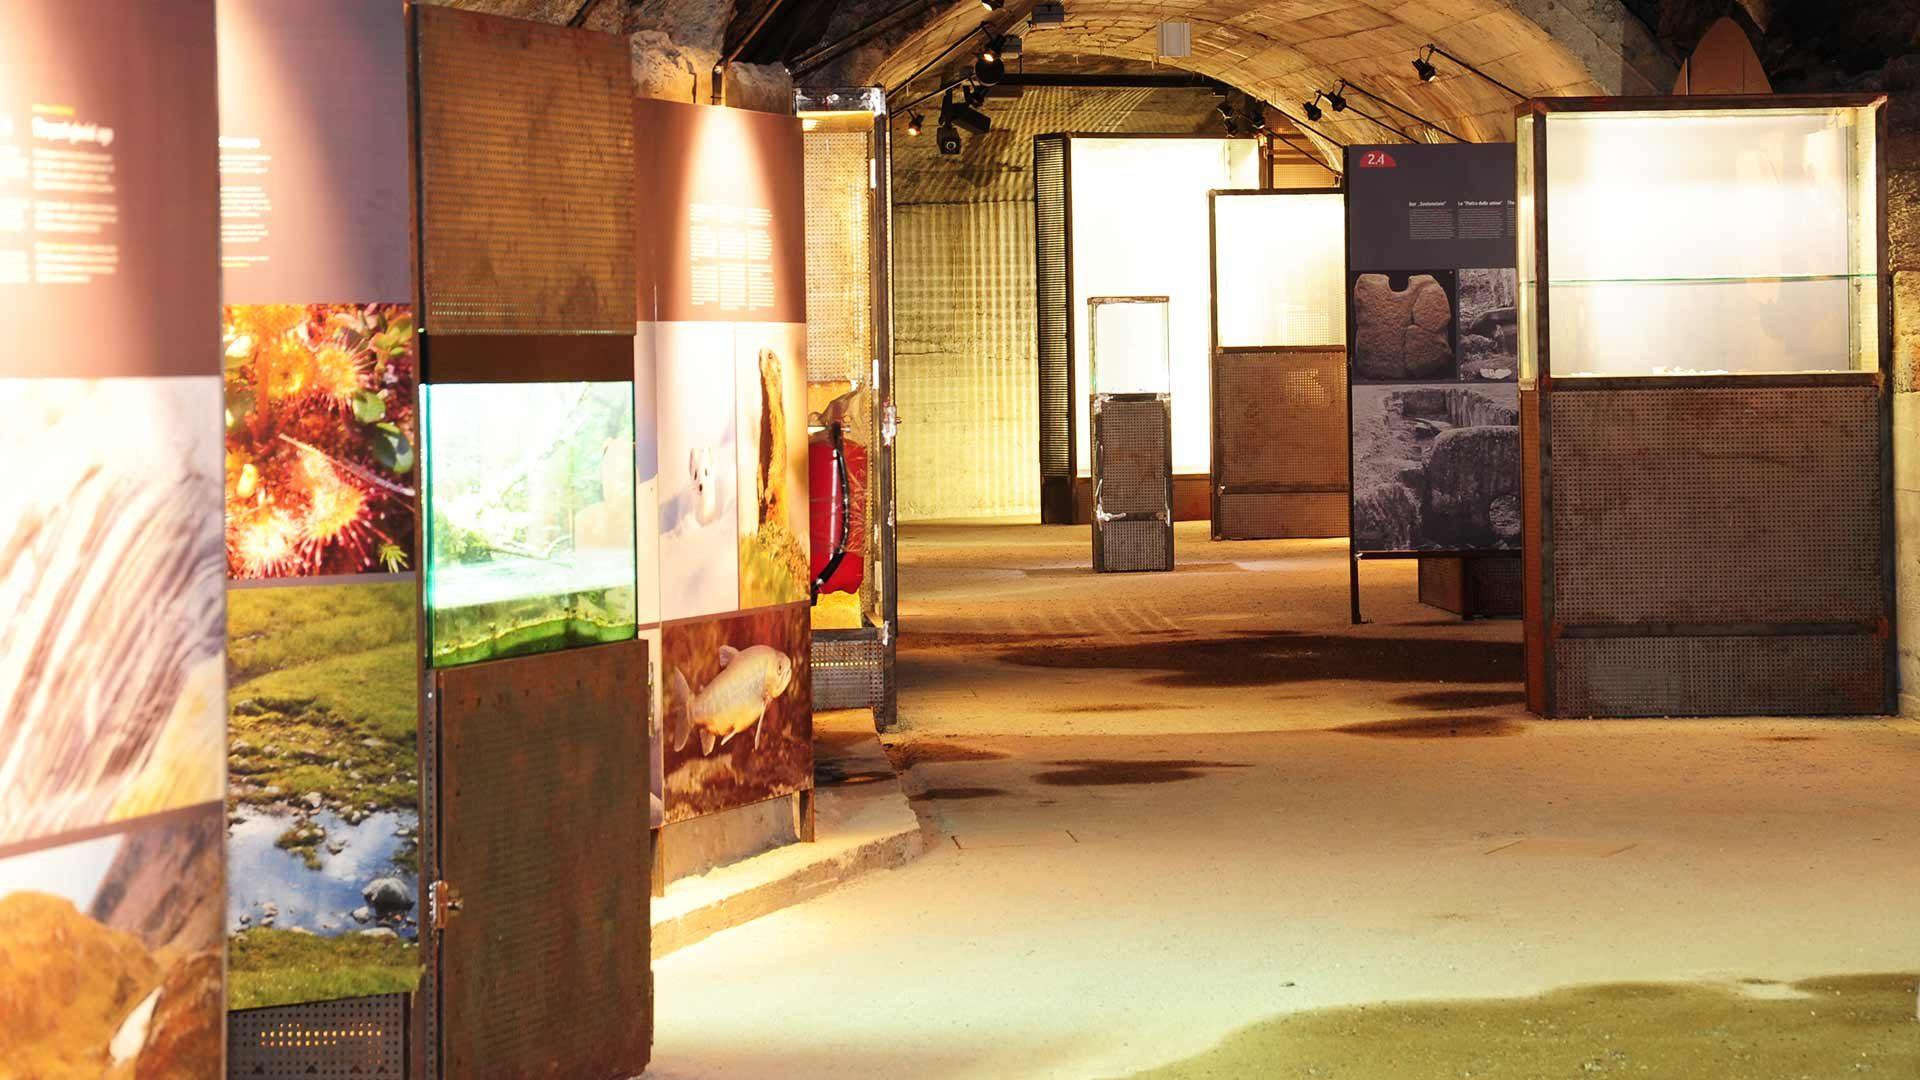 Bunker Mooseum a Moso